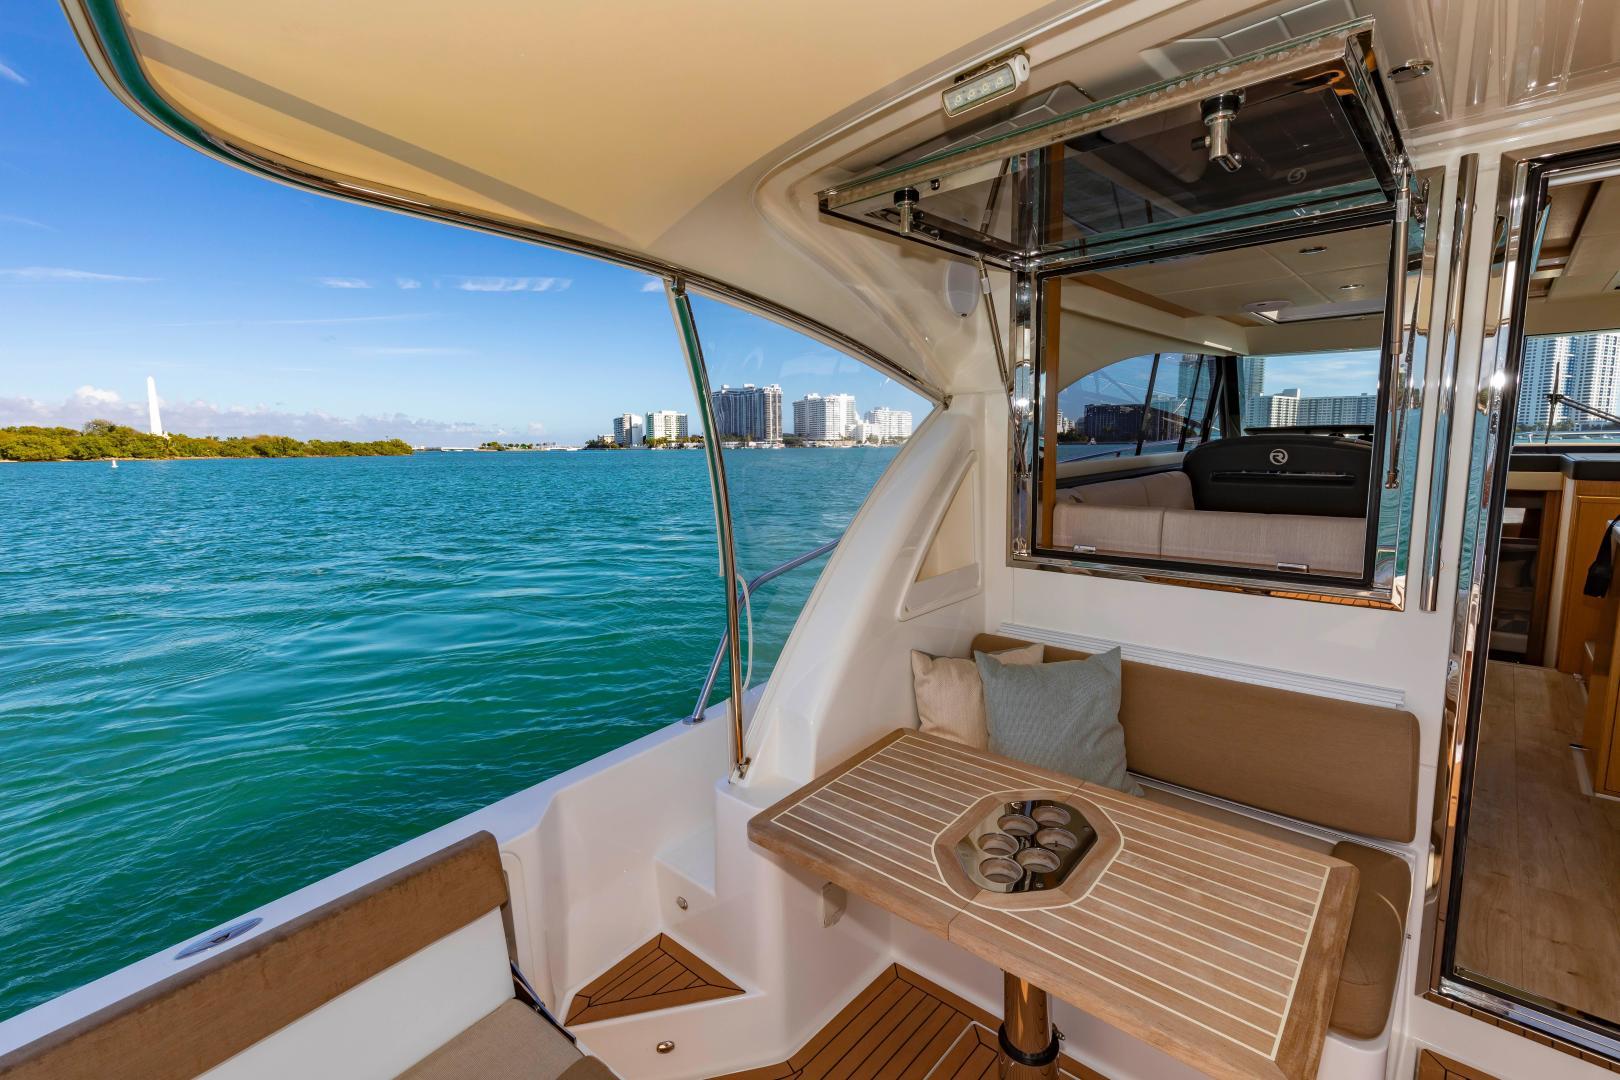 Riviera-395 SUV 2019-Ipanema Miami Beach-Florida-United States-1614888   Thumbnail